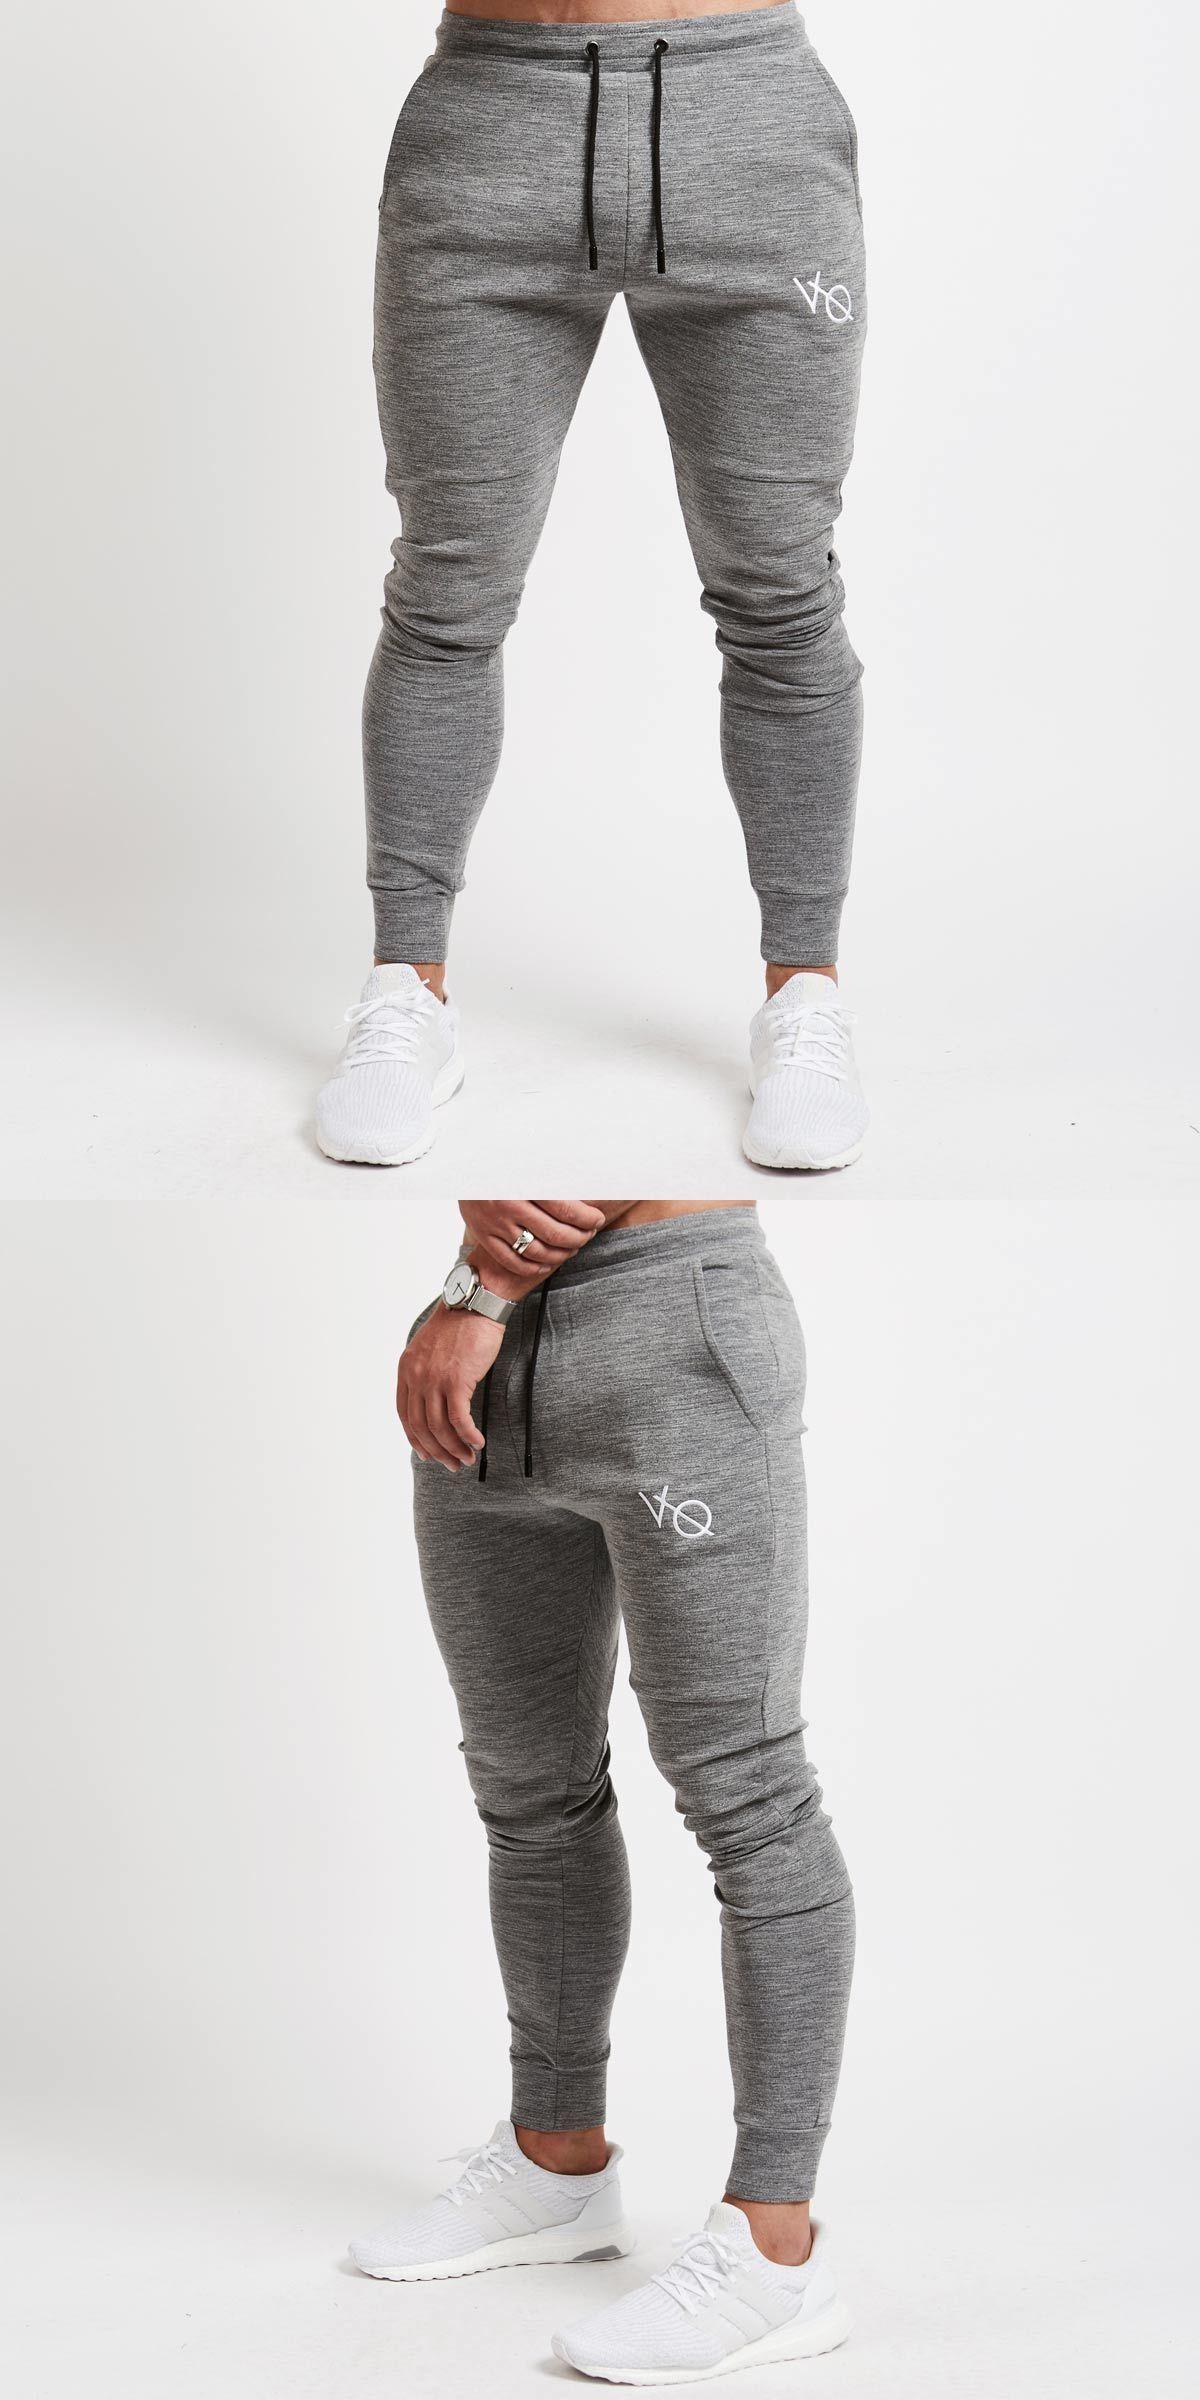 e06d0a54f769 New Fashion Fitness Slim Fit Men Pants Brand New Pant Casual Style Jogger  Mam Sweatpants Bodybuilding Male Sportpants